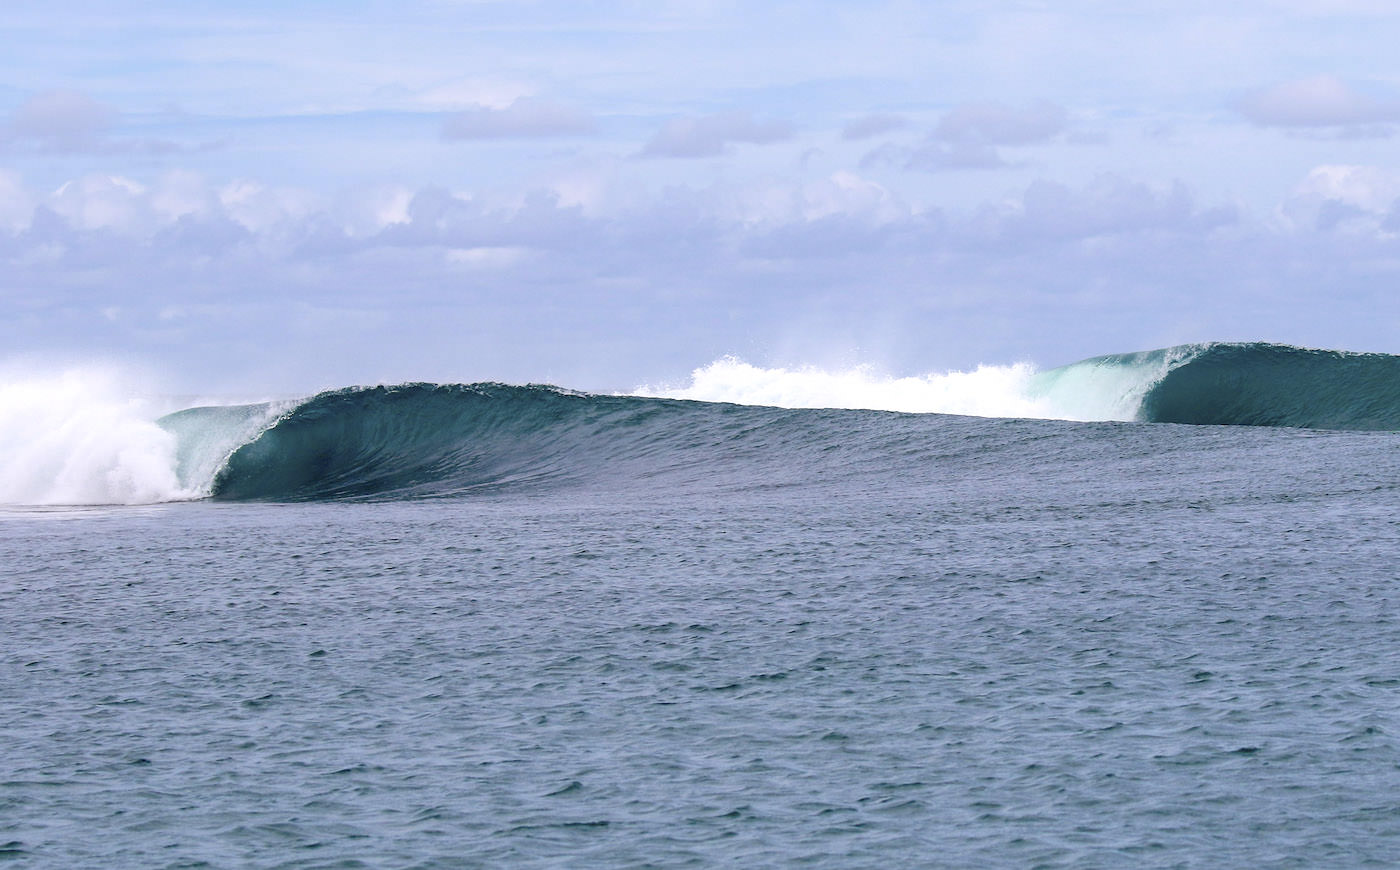 Moon Palikir Surf Charter Boat Mentawai Islands Surfing